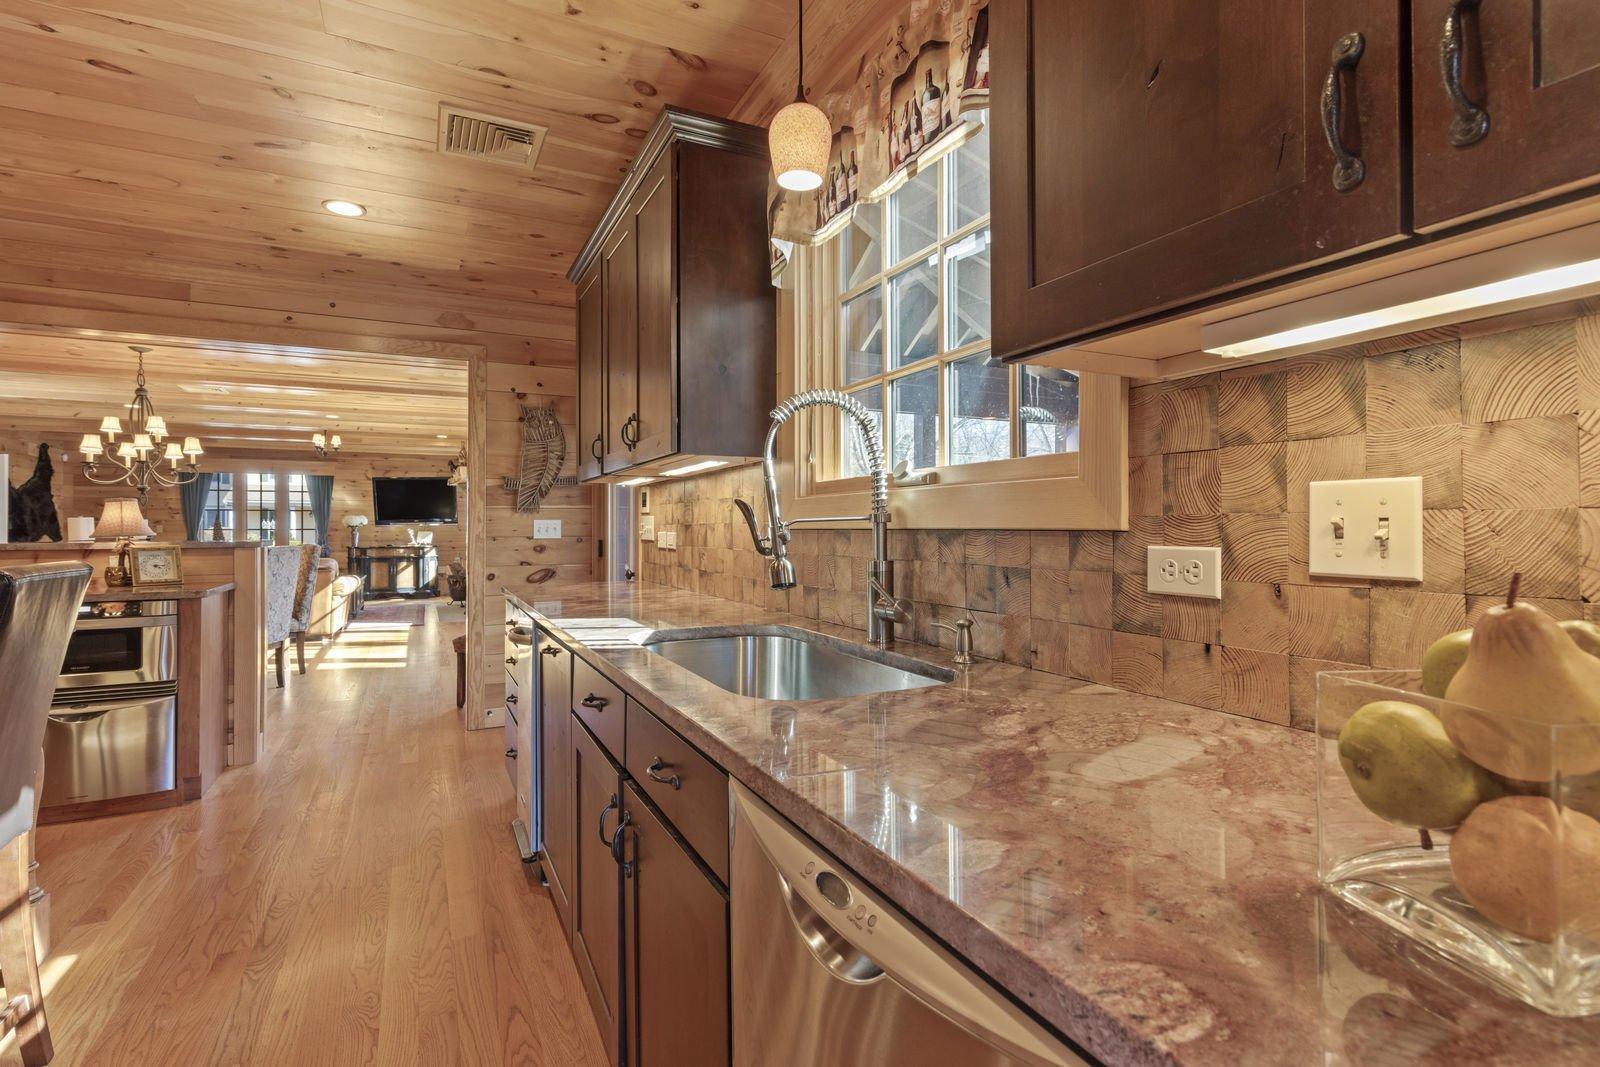 Kitchen, Medium Hardwood Floor, Dishwasher, Wood Cabinet, Undermount Sink, and Granite Counter  Shingle Style Rustic Chic